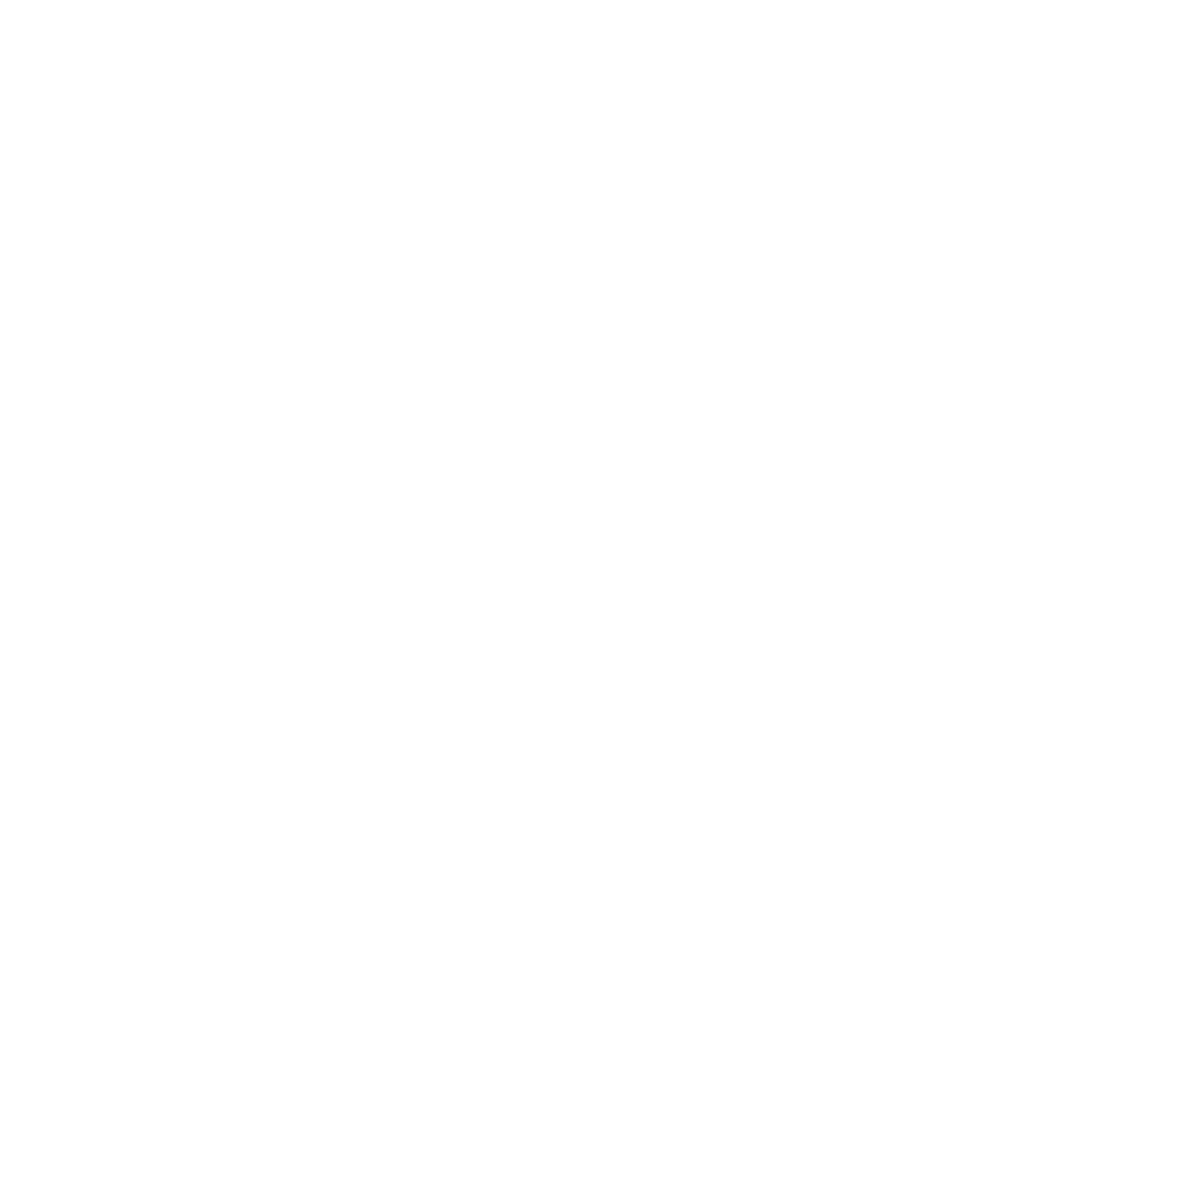 logo Maxlhaid